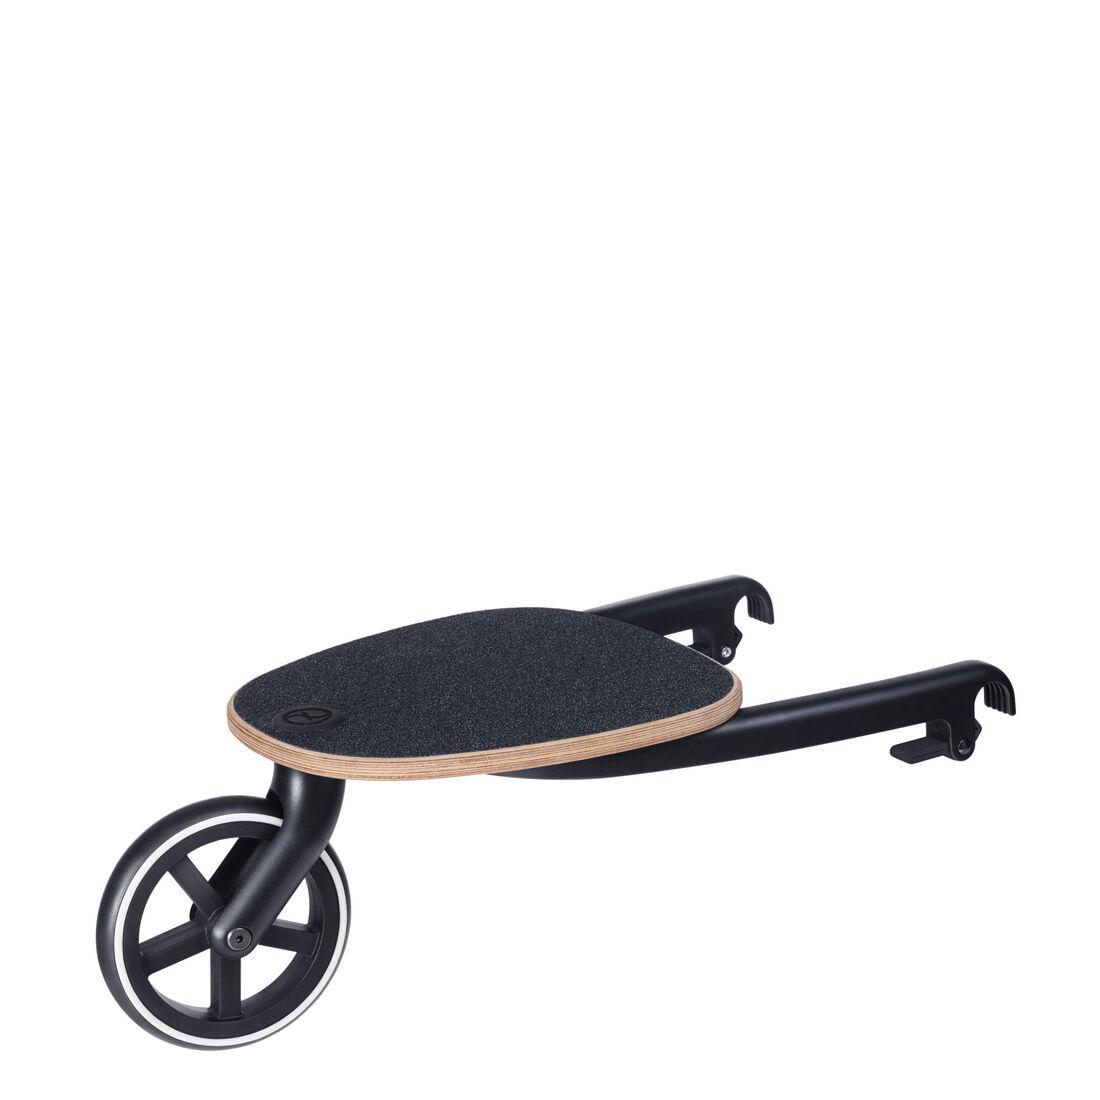 CYBEX Kid Board - Black in Black large Bild 1